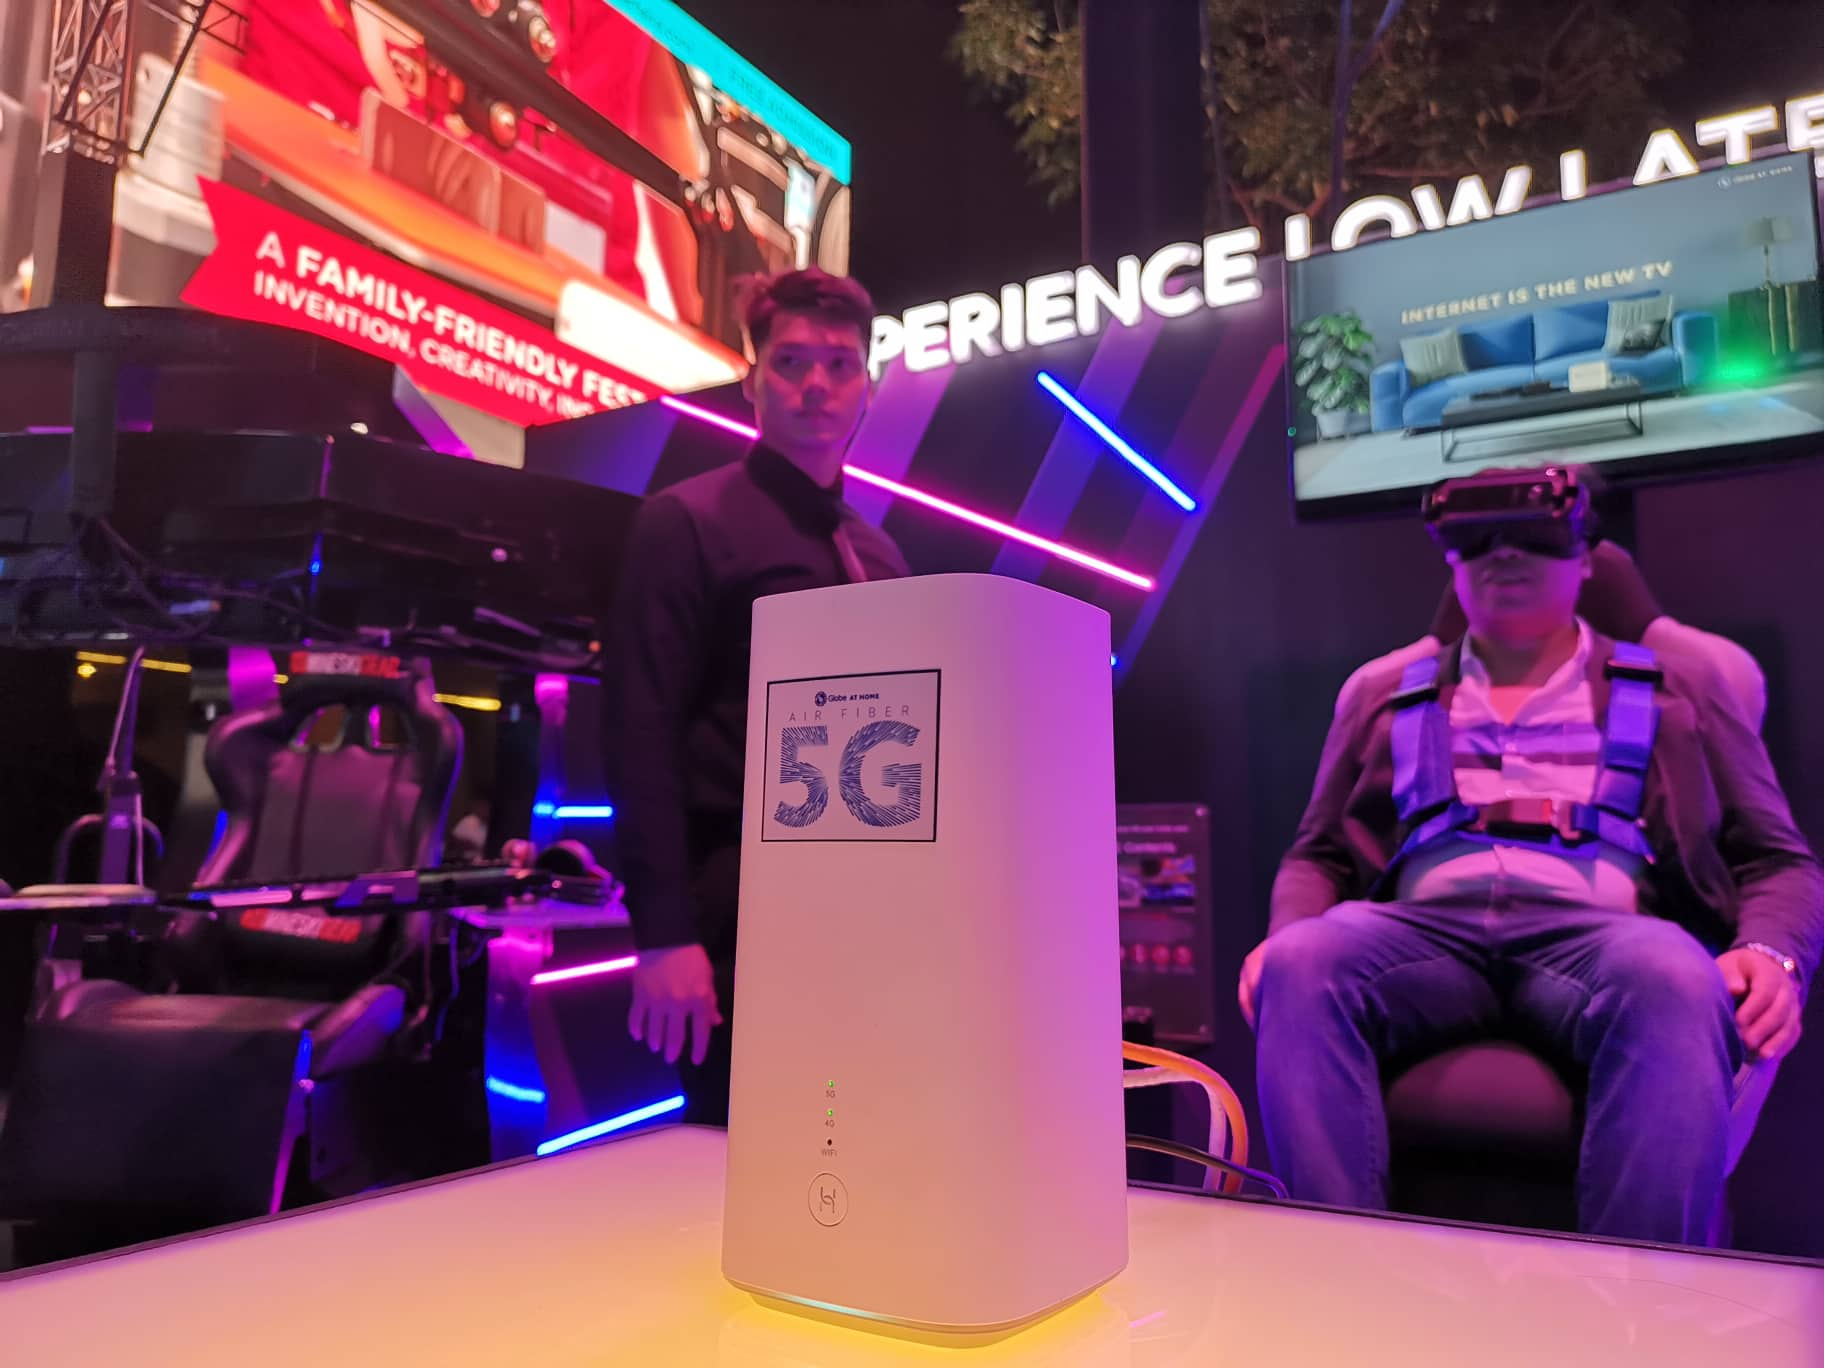 Globe at Home Air Fiber 5G unveiled